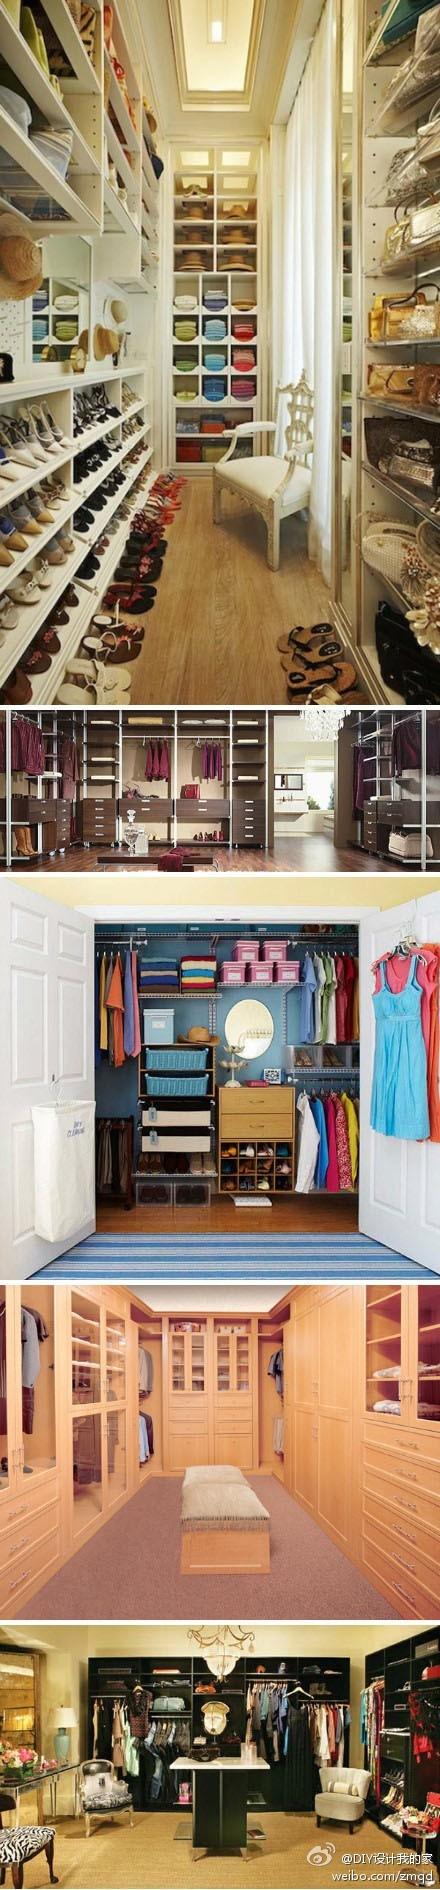 most amazing closet ever